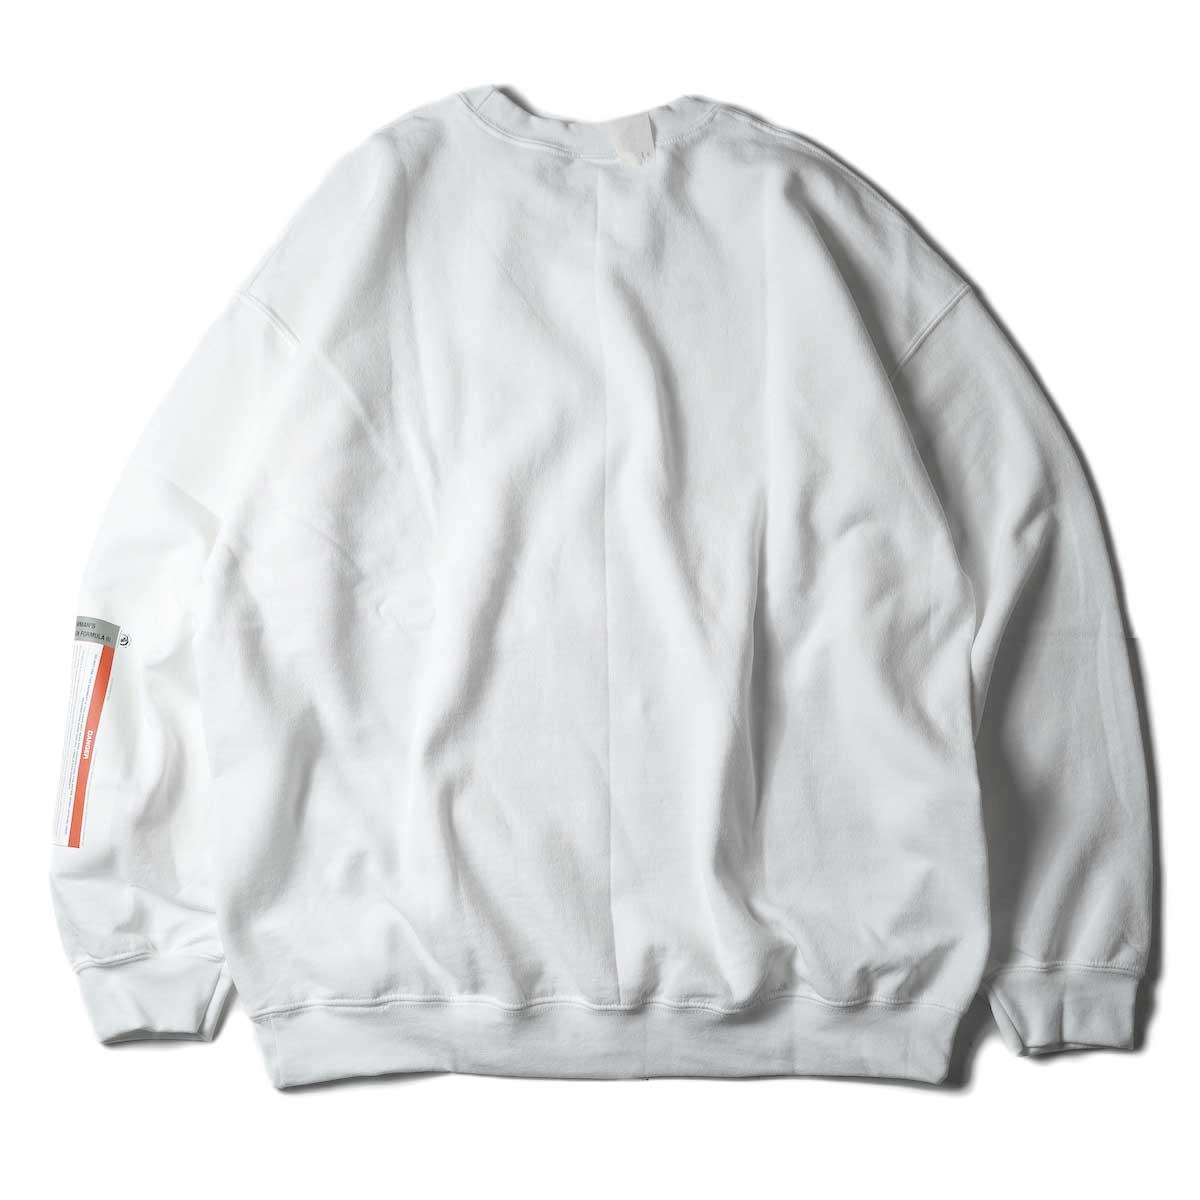 N.HOOLYWOOD / 9212-CS85 Crew Neck Sweat Shirt (White)背面